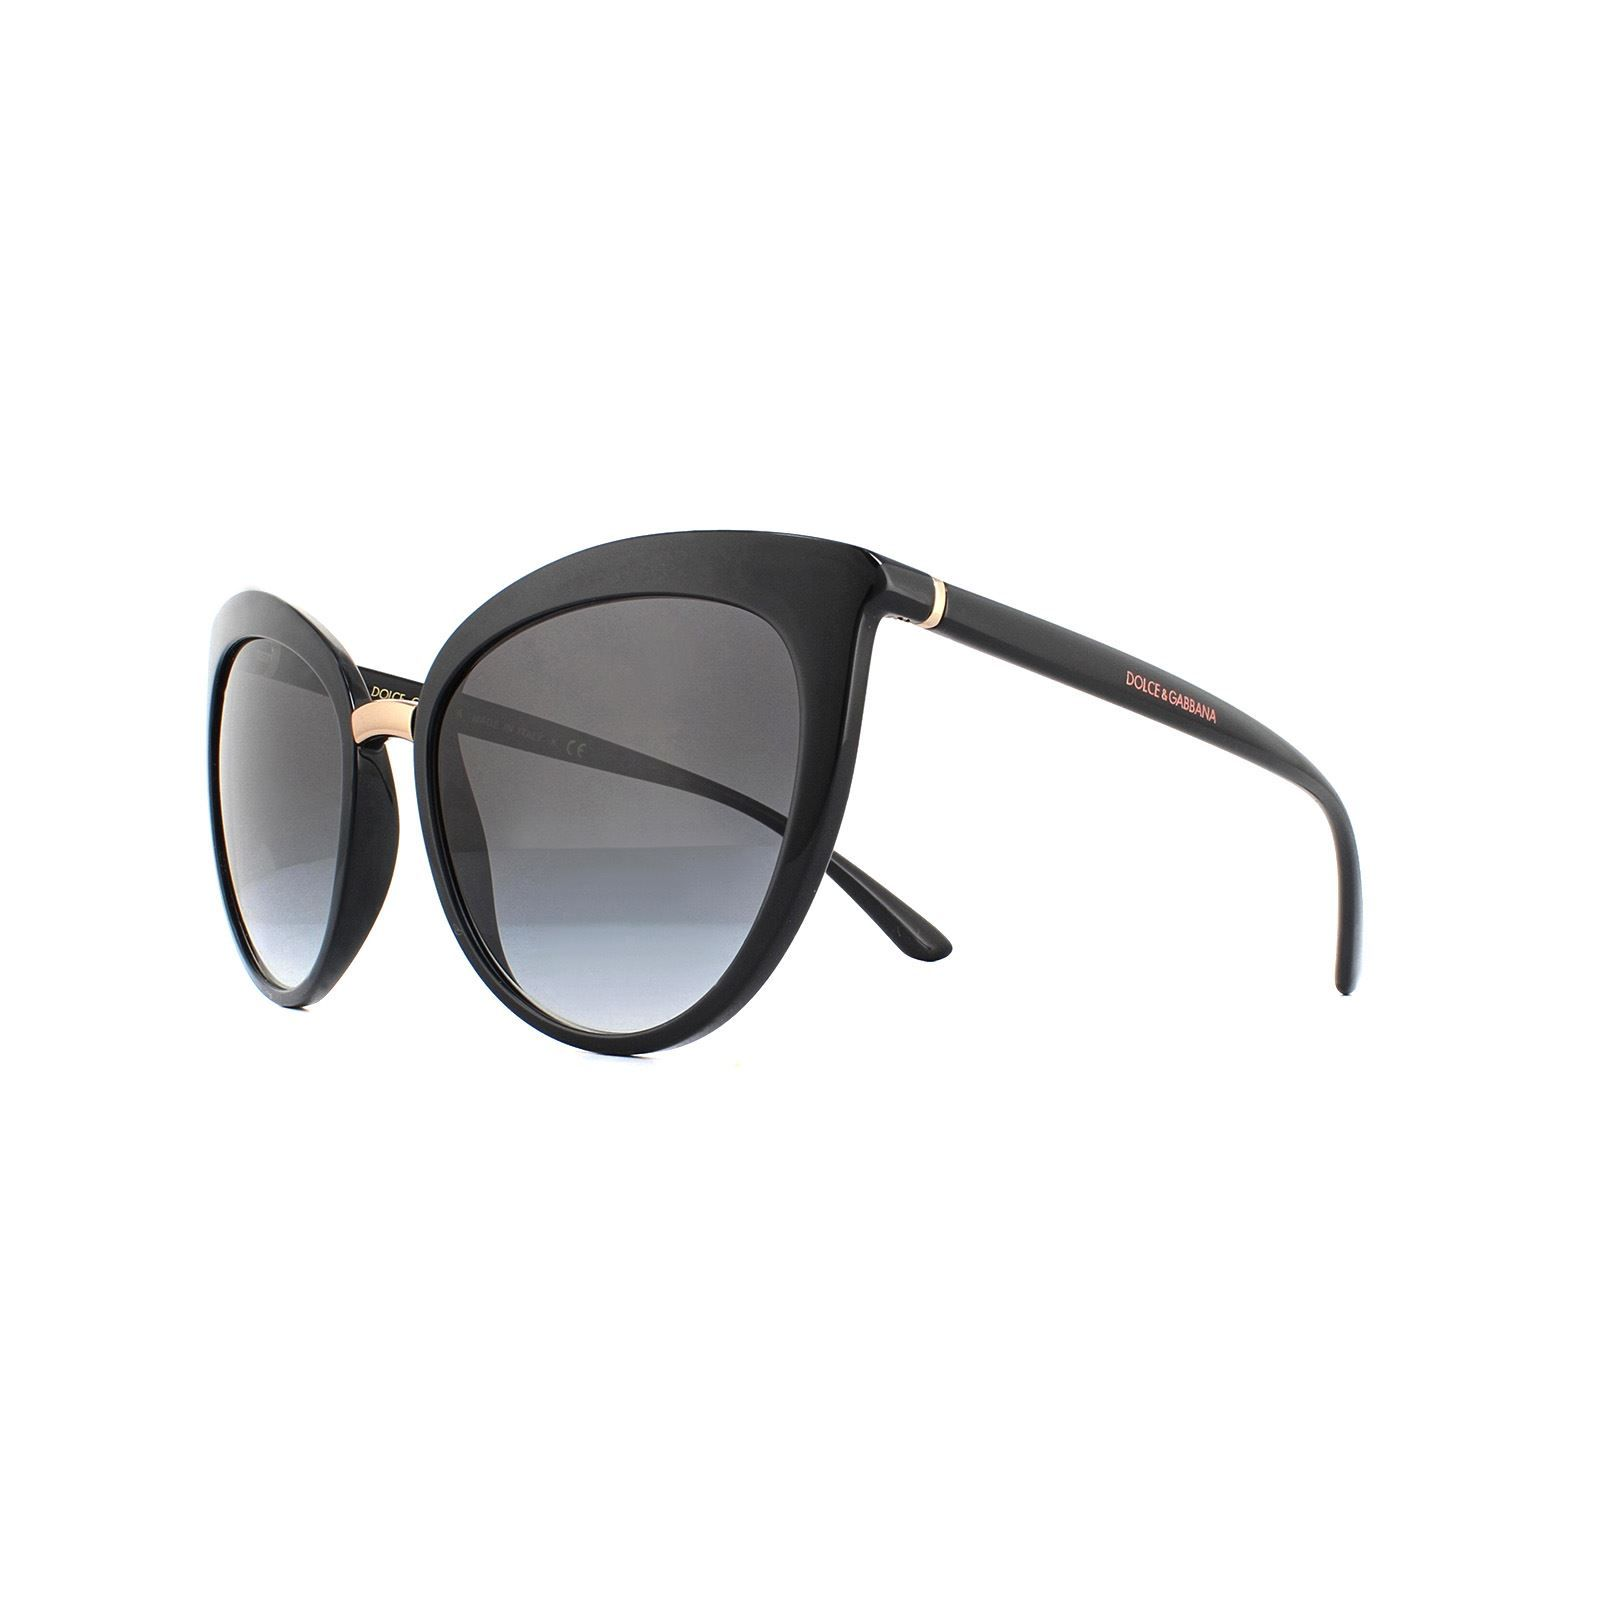 Dolce & Gabbana Sunglasses DG6113 501/8G Black Grey Gradient